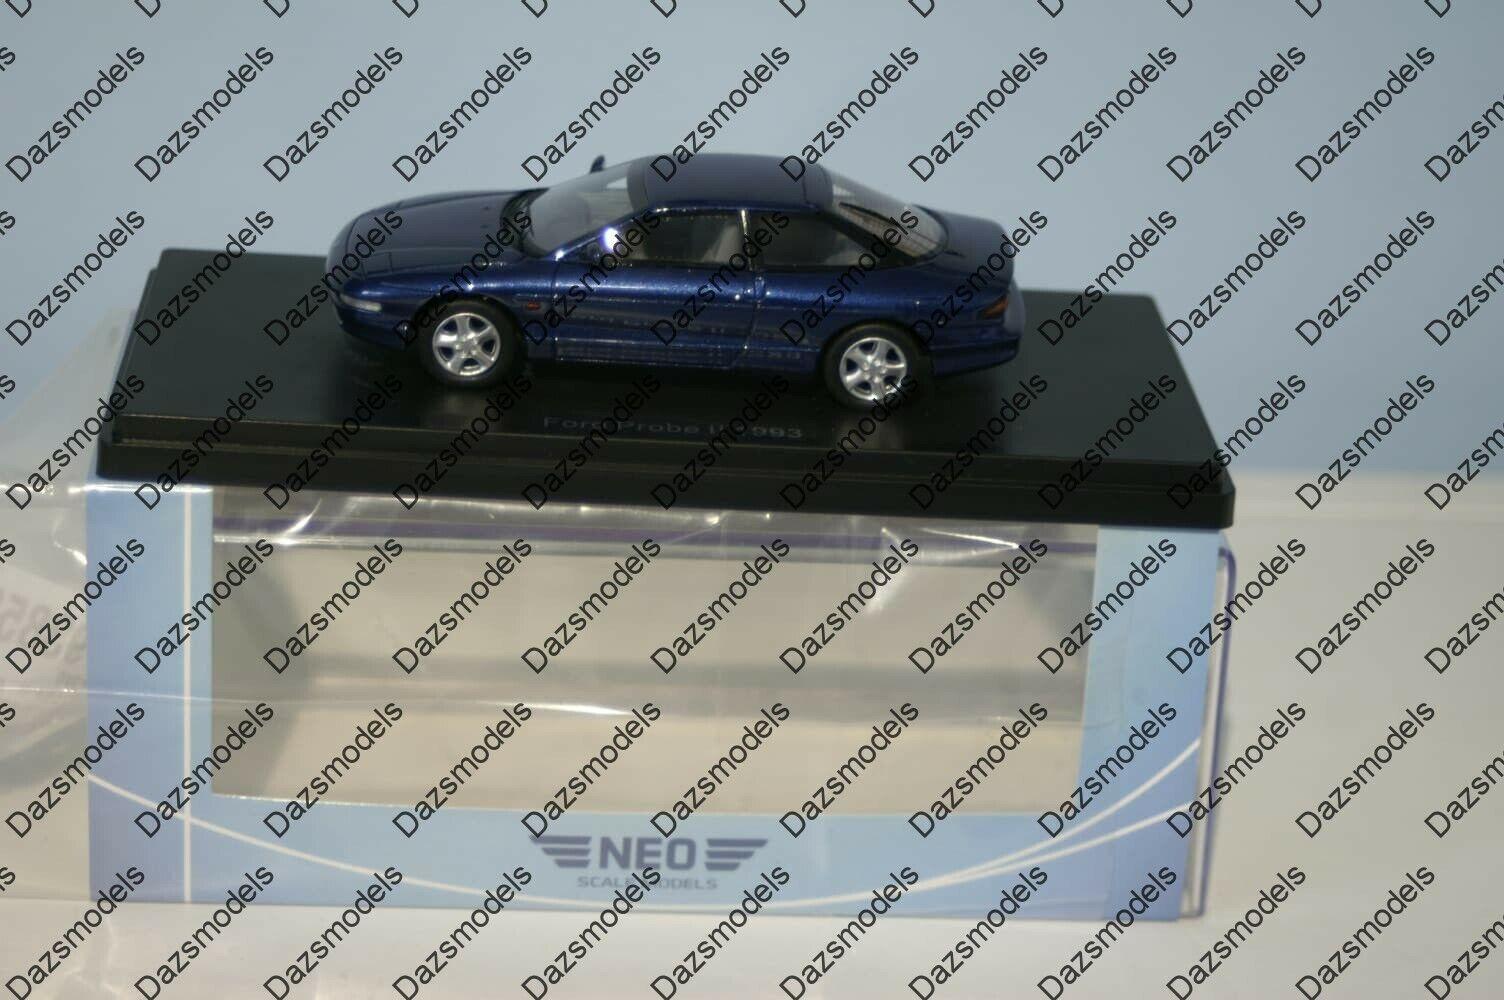 NEO MODELS Ford Probe Mk2 Bleu NEO47120 échelle 1 43